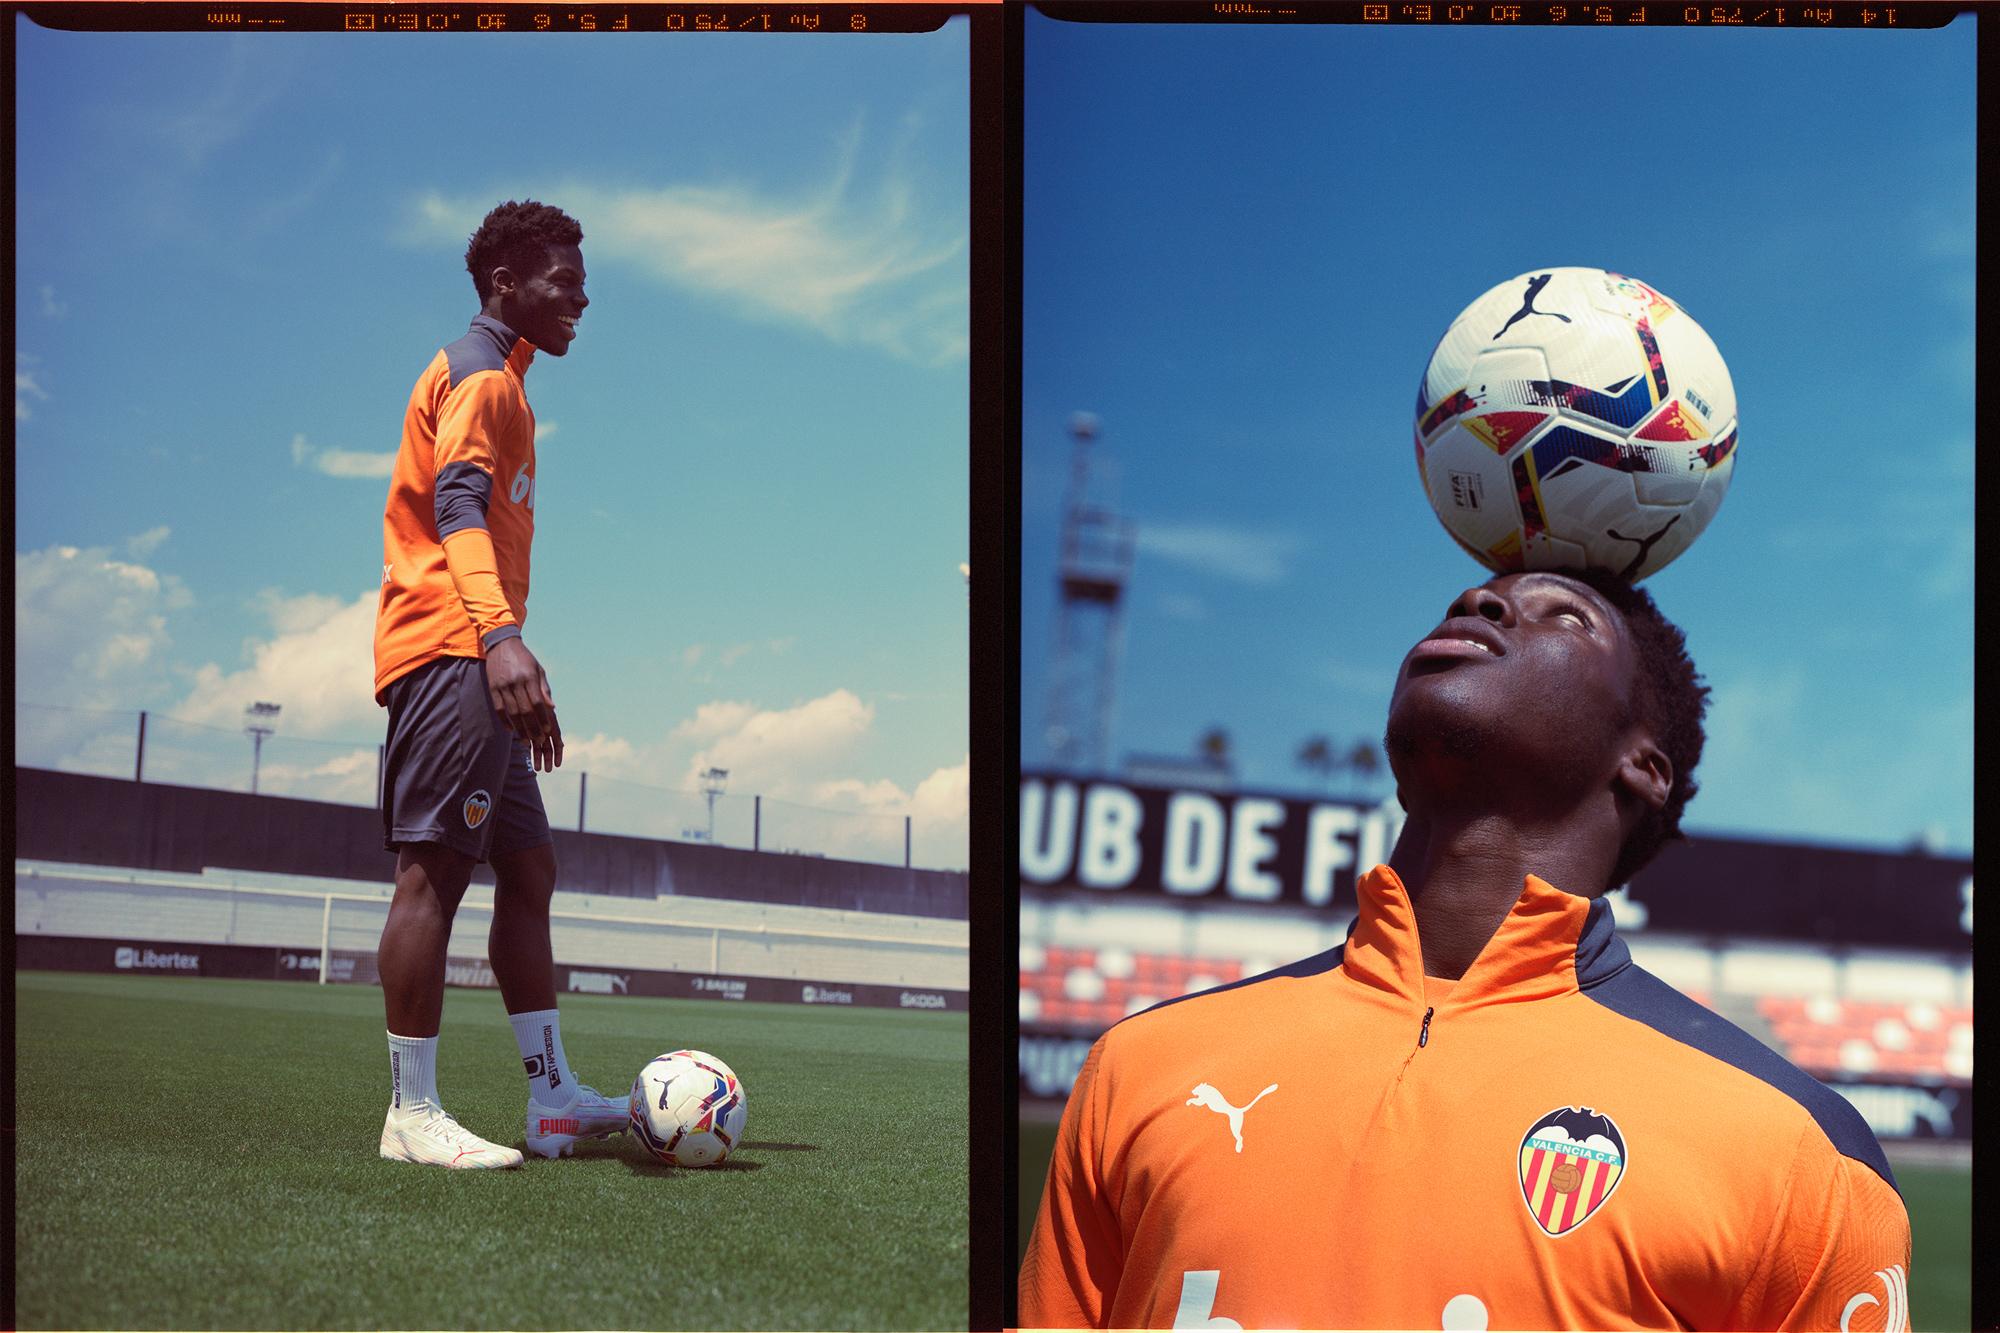 Colour medium format photo of football player Yunus Musah